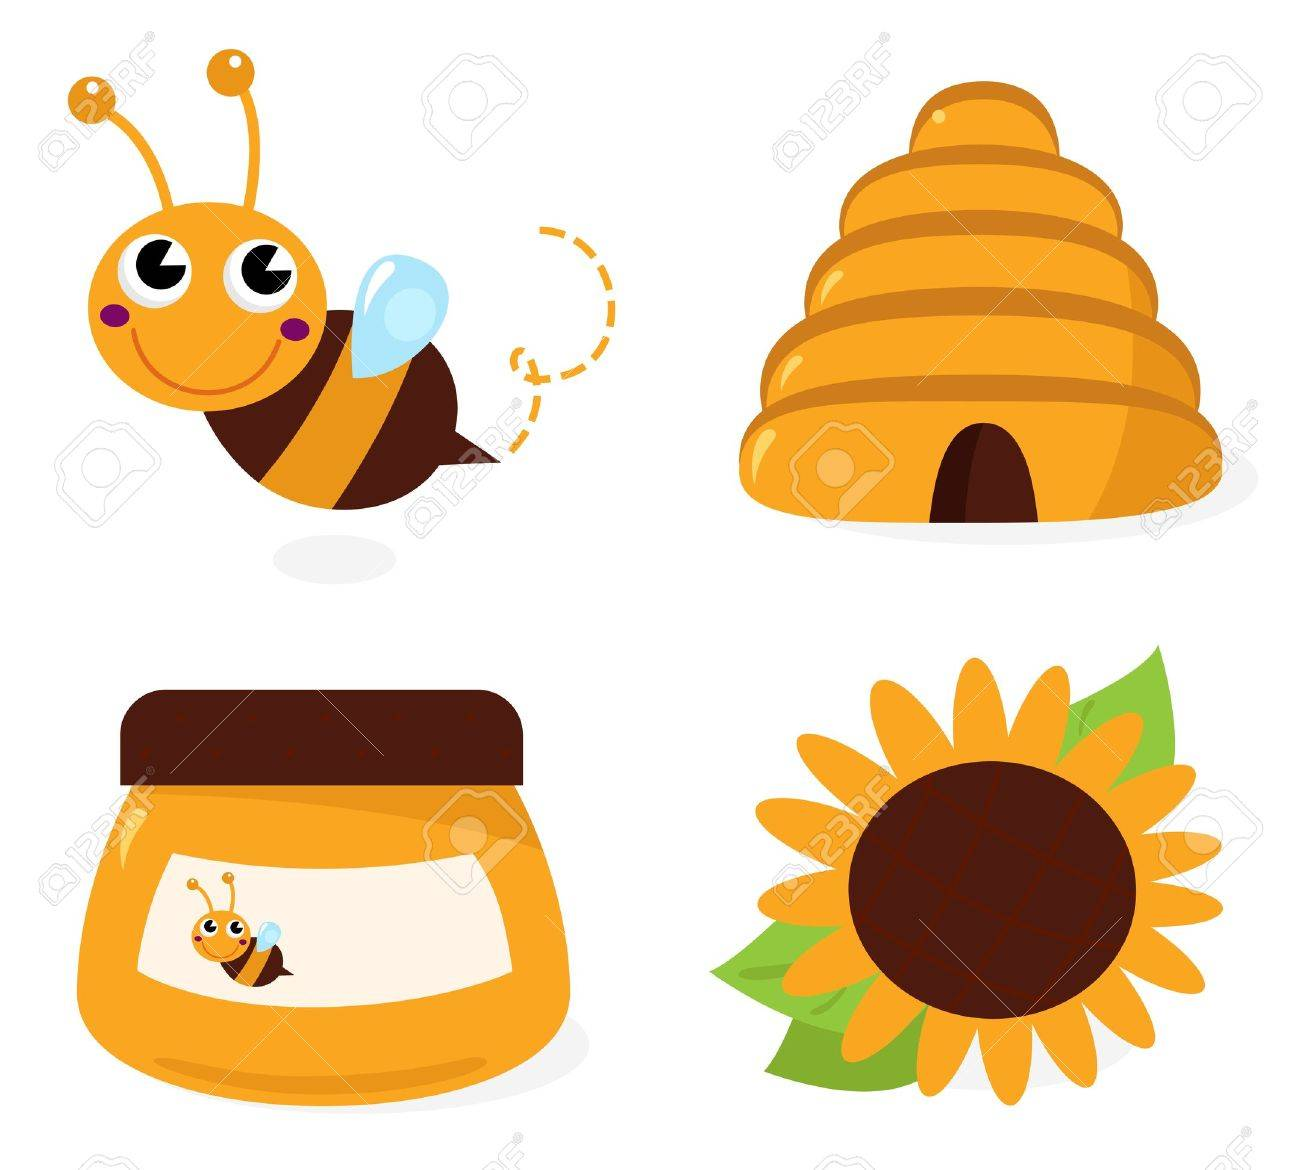 Cute Bee And Honey Set Cartoon Illustration